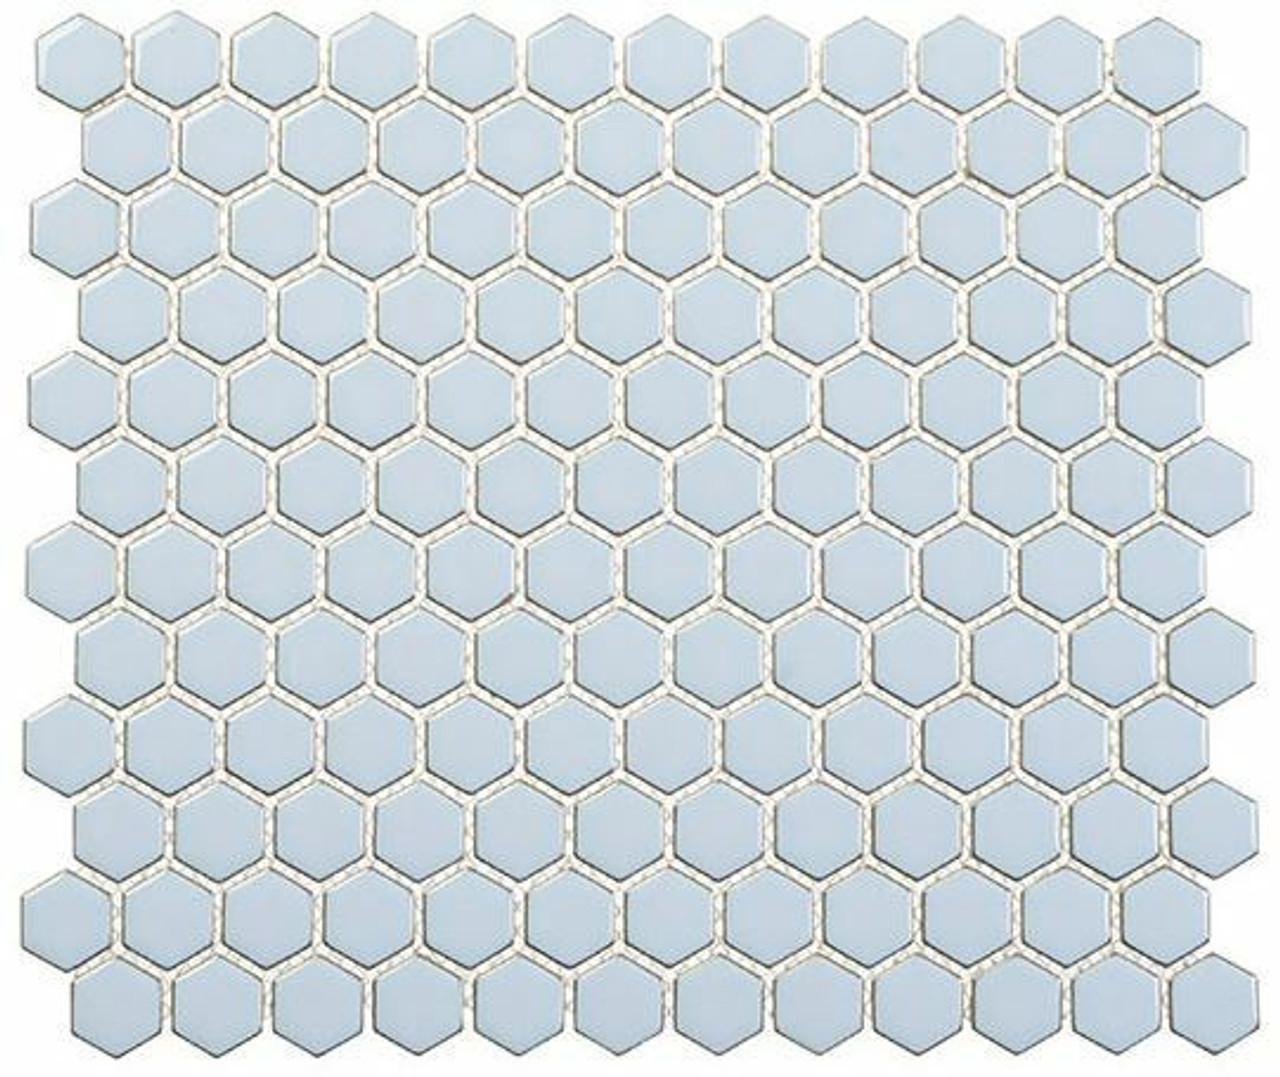 Bella Glass Tiles Effortless Series Hexagon Kool Vibe EFT8913